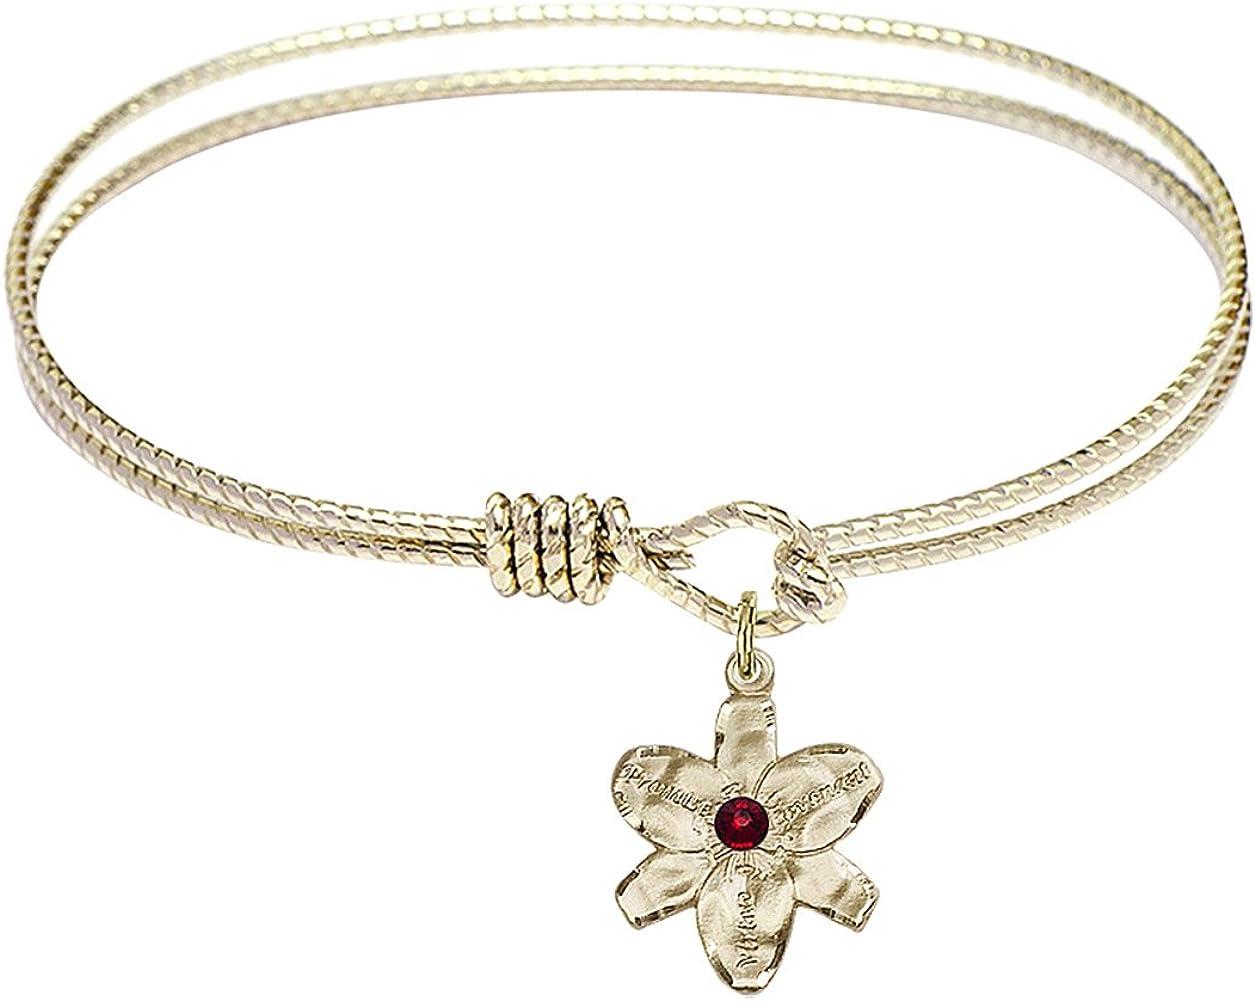 DiamondJewelryNY Eye Hook Bangle Bracelet Soldering Charm. a with Chastity Finally popular brand